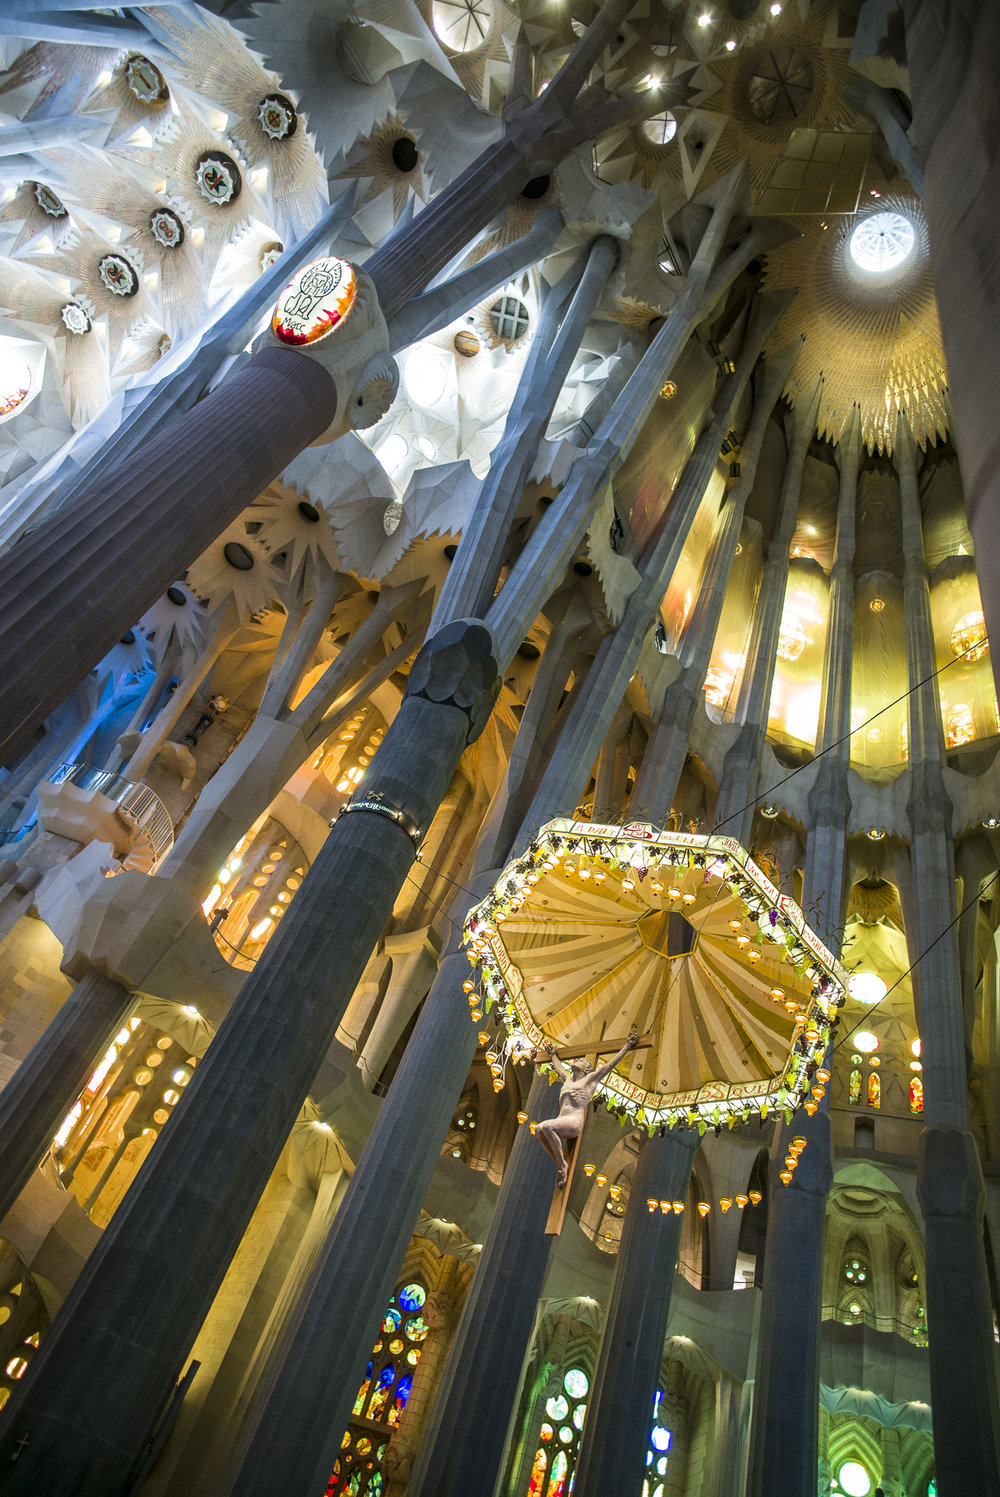 Gaudi's Masterpiece, La Sagrada Familia